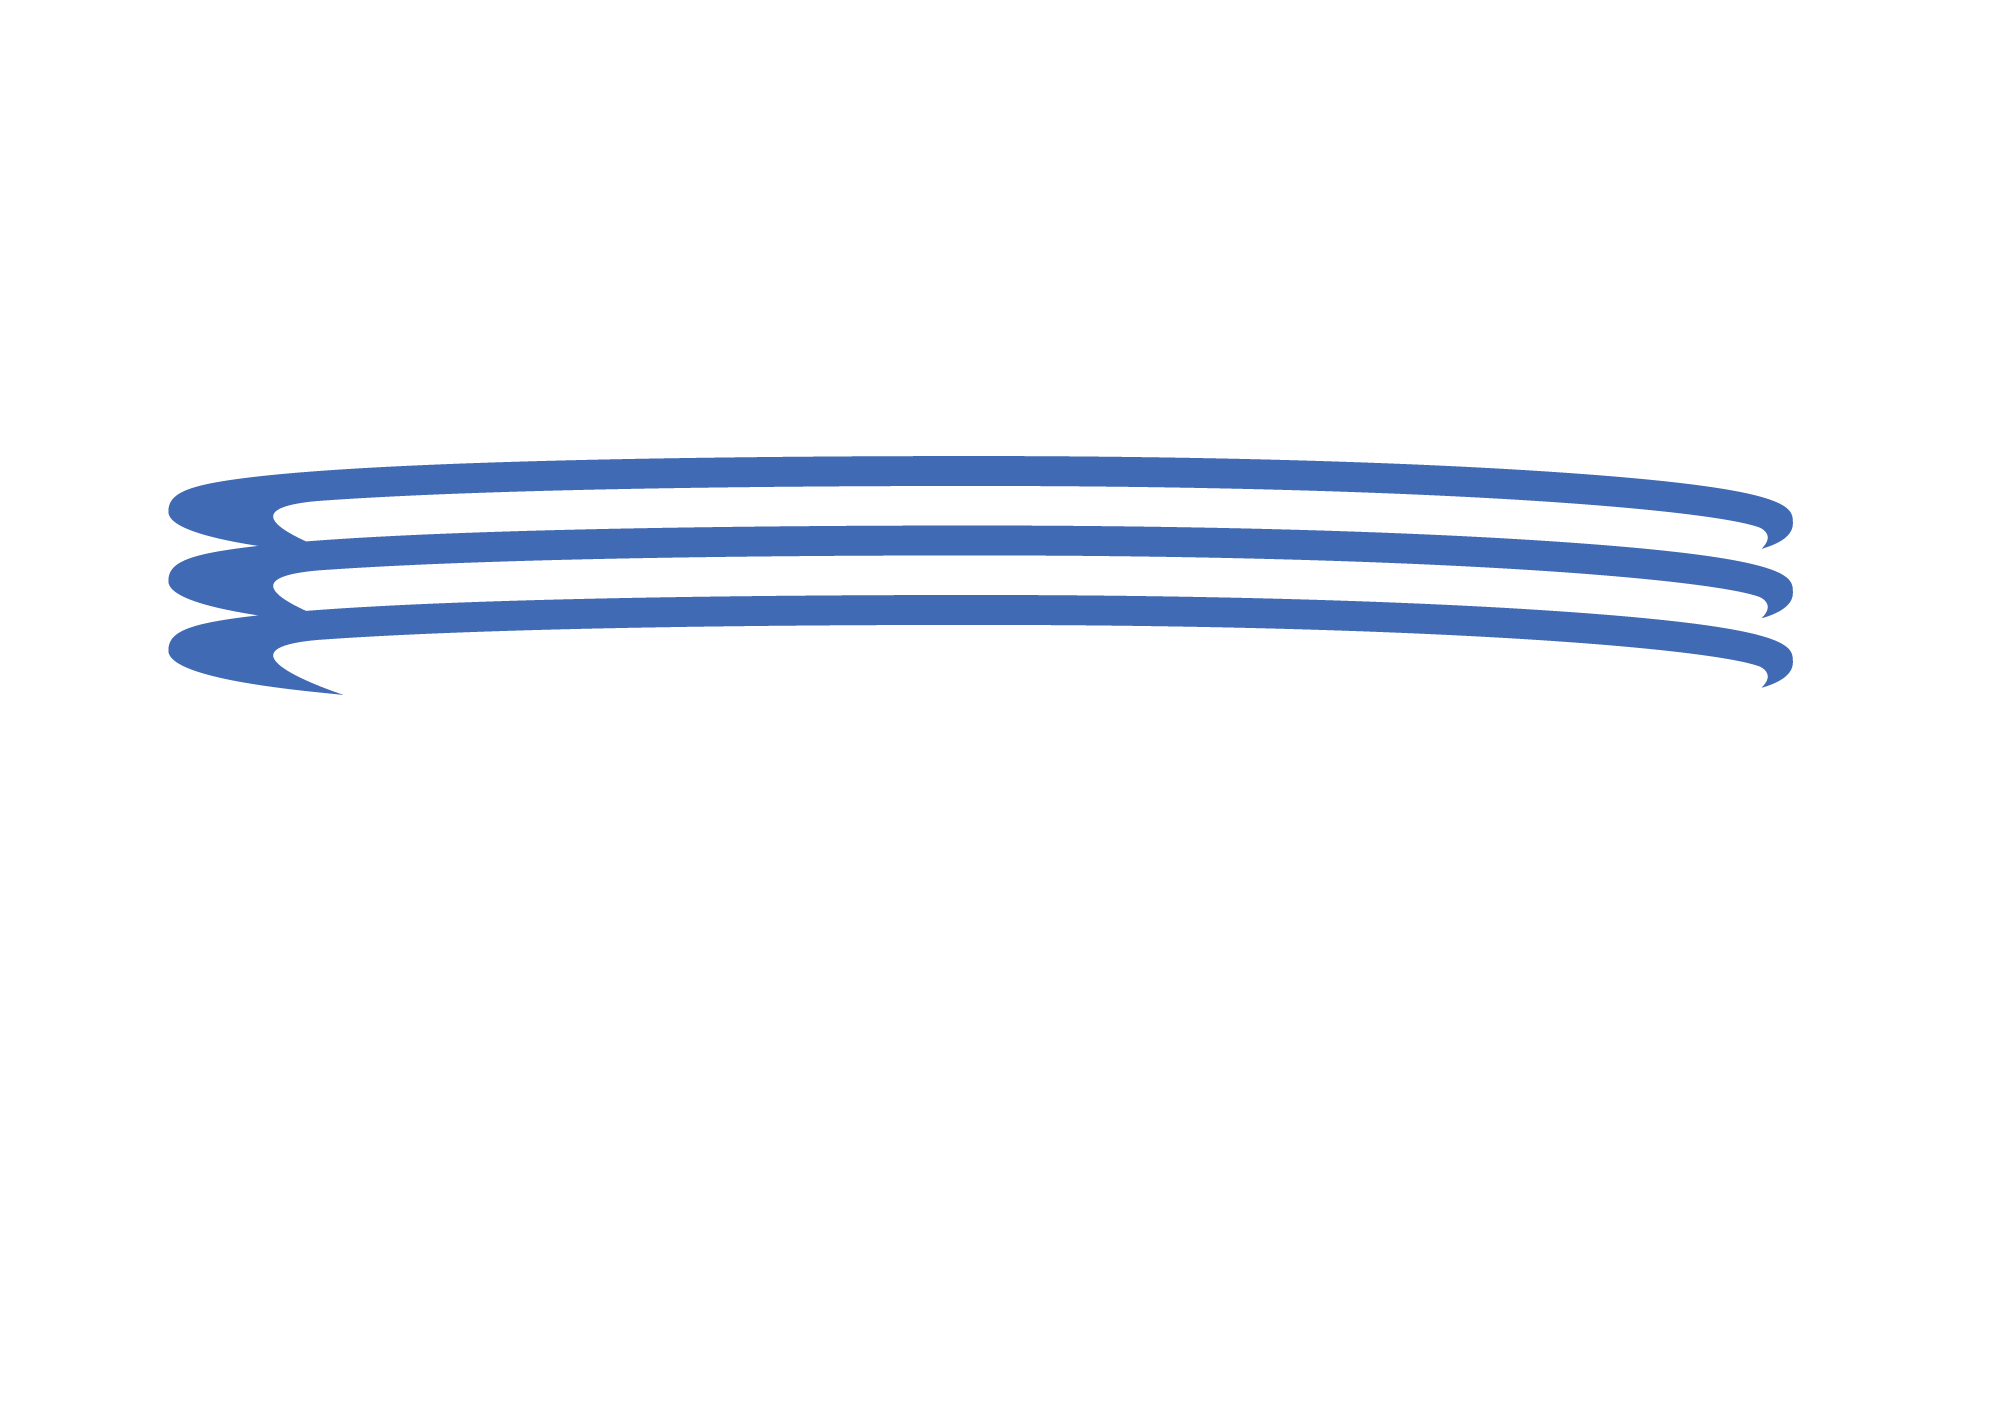 Rocco Prosthetics & Orthotic Center Logo